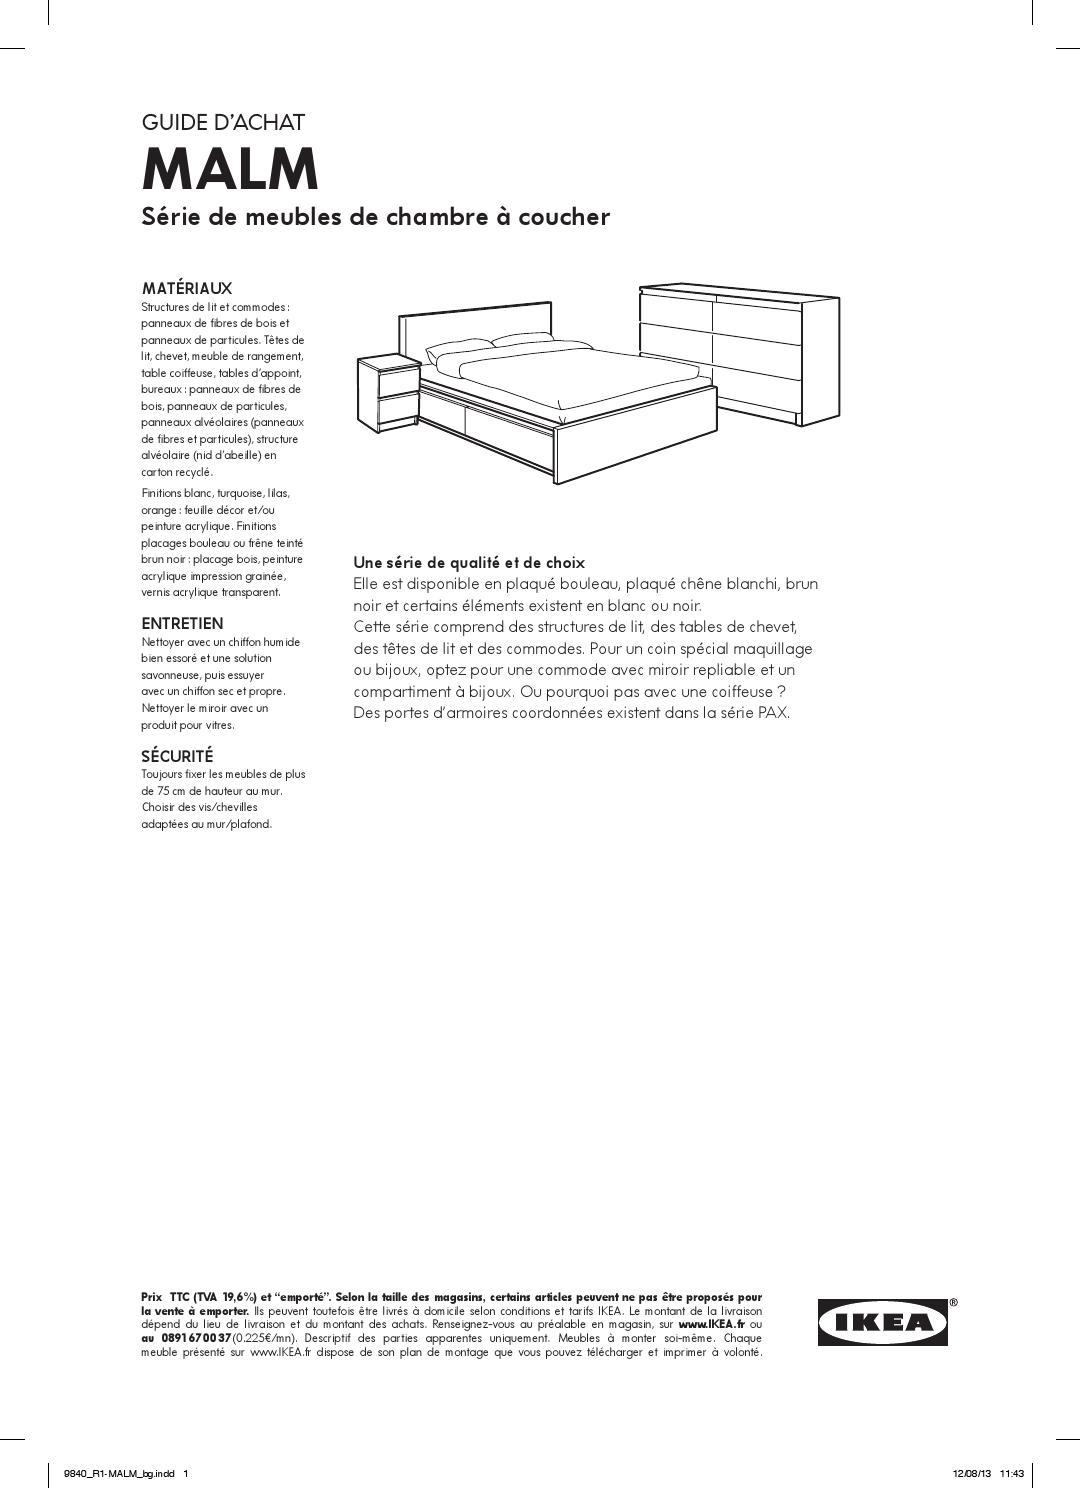 malm meuble chambre ikea fr by ikea catalog issuu. Black Bedroom Furniture Sets. Home Design Ideas